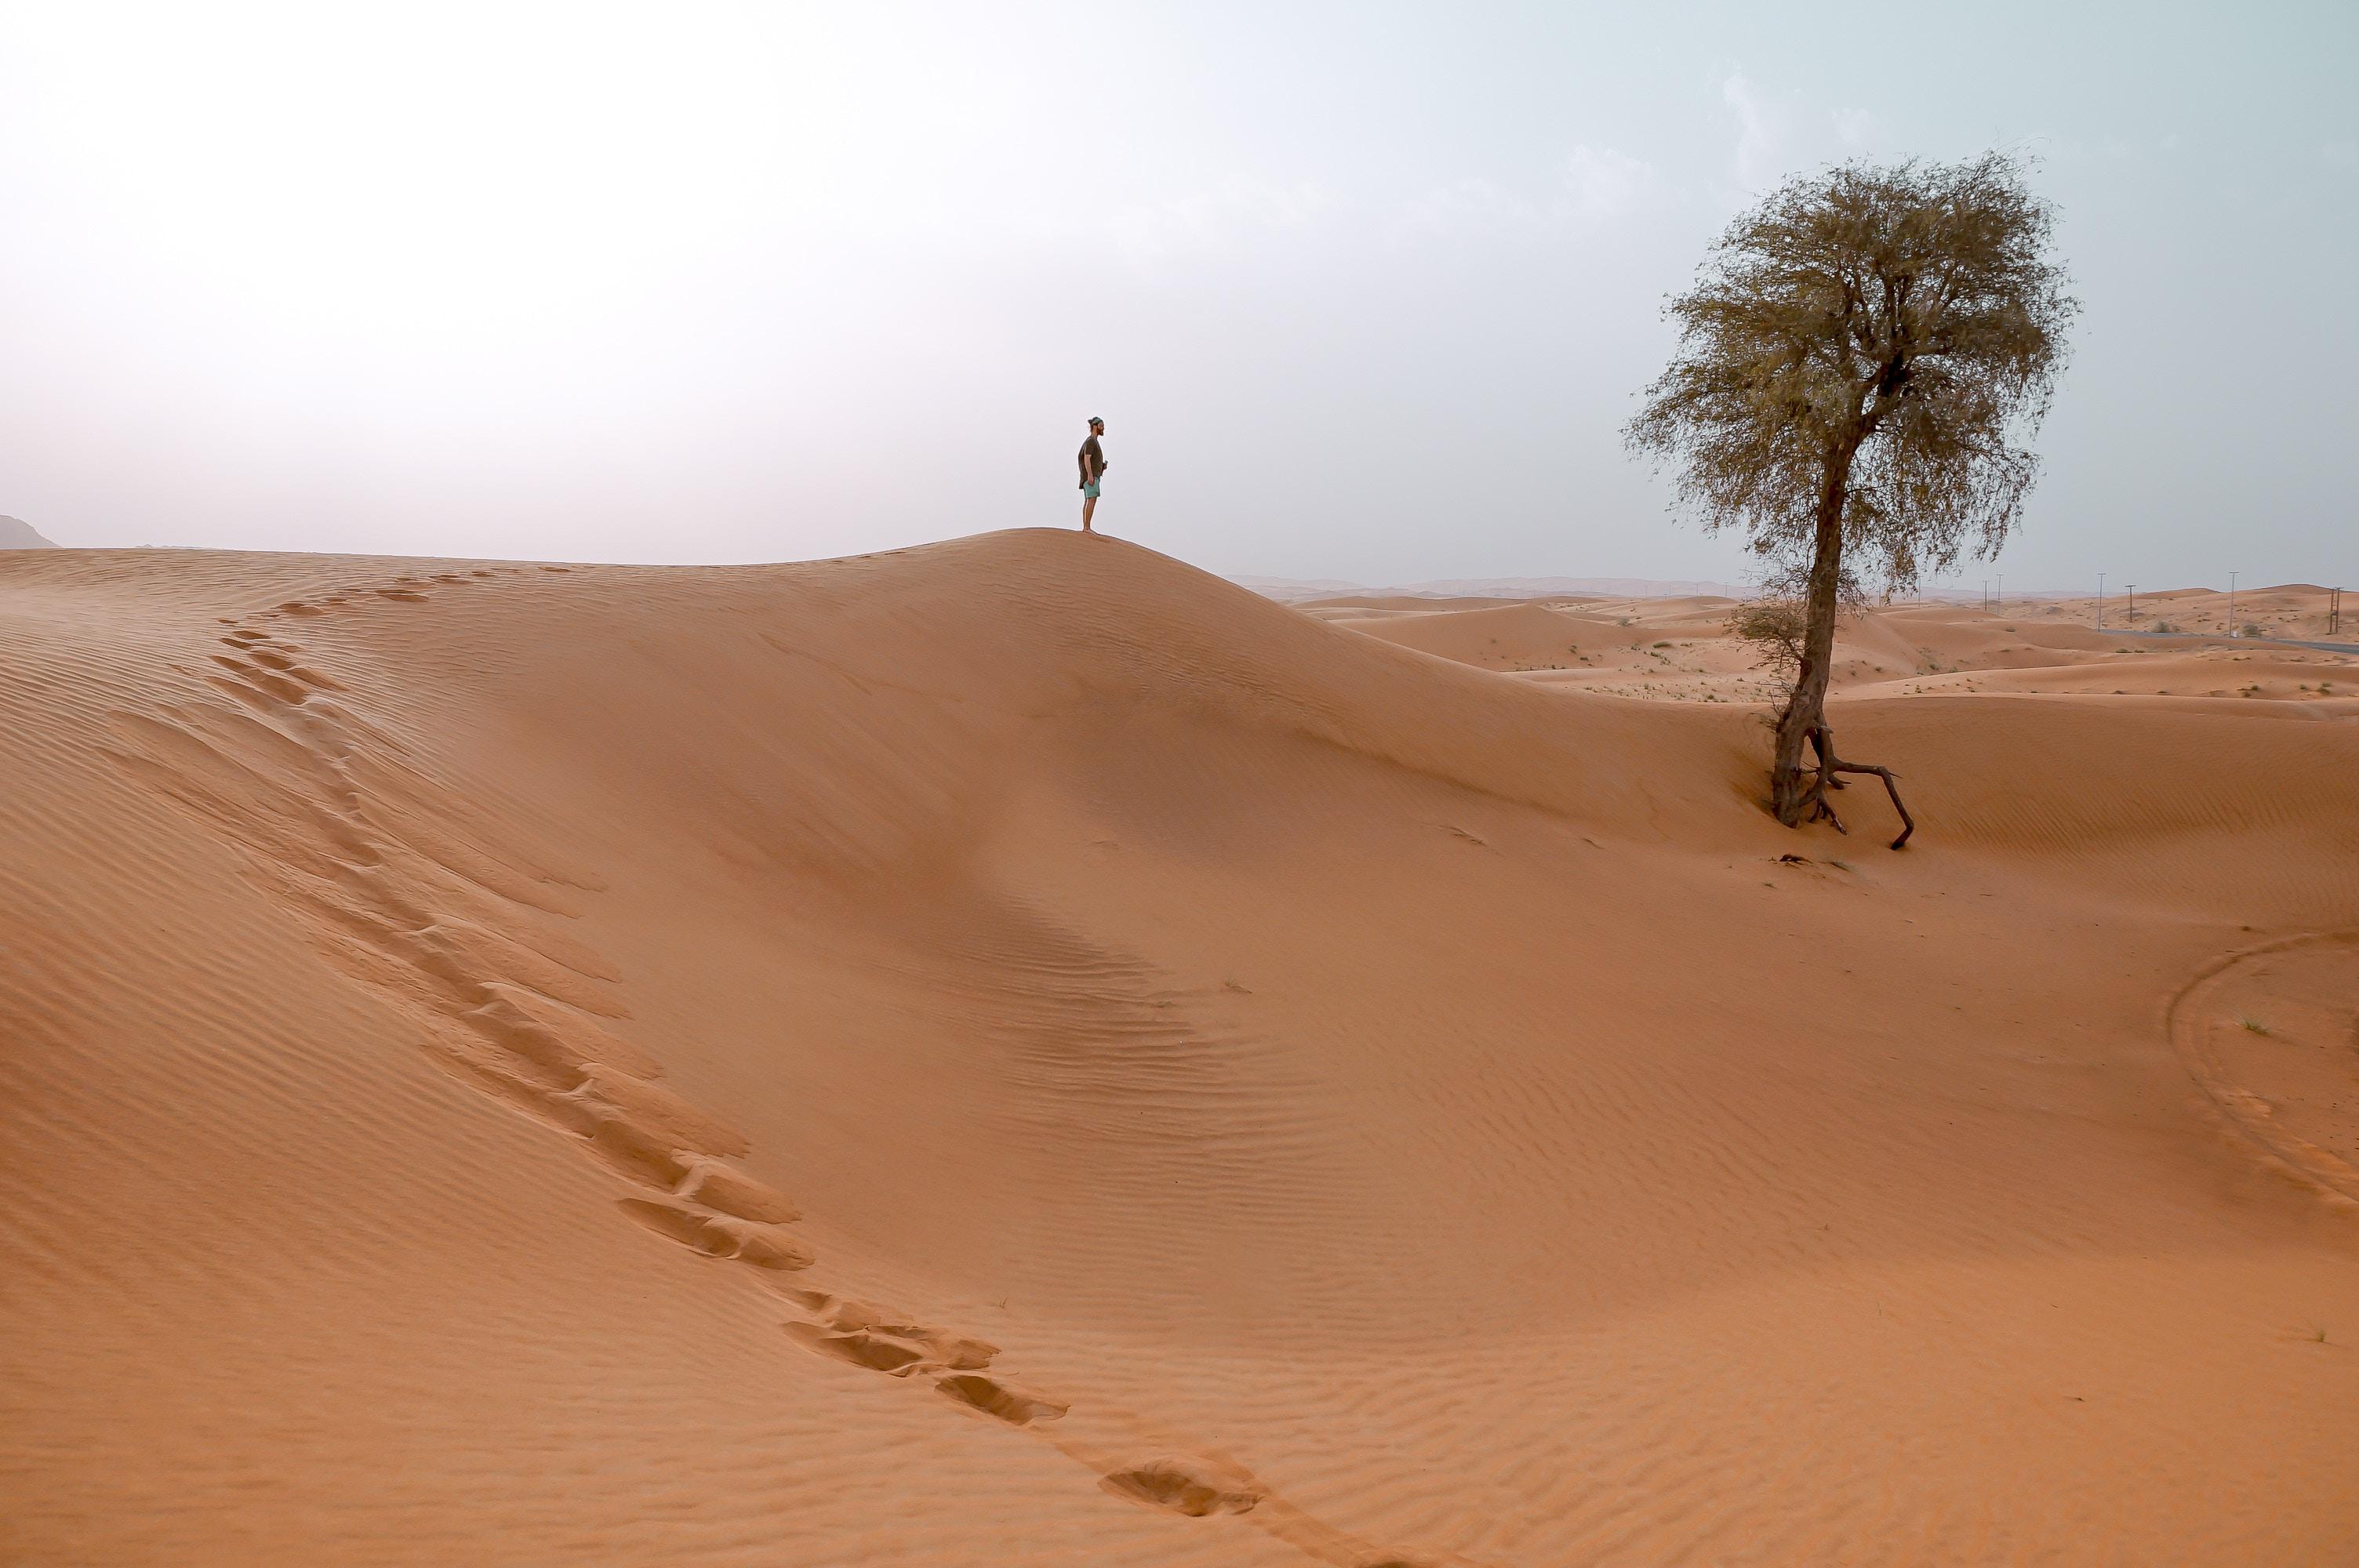 Lone figure in the desert